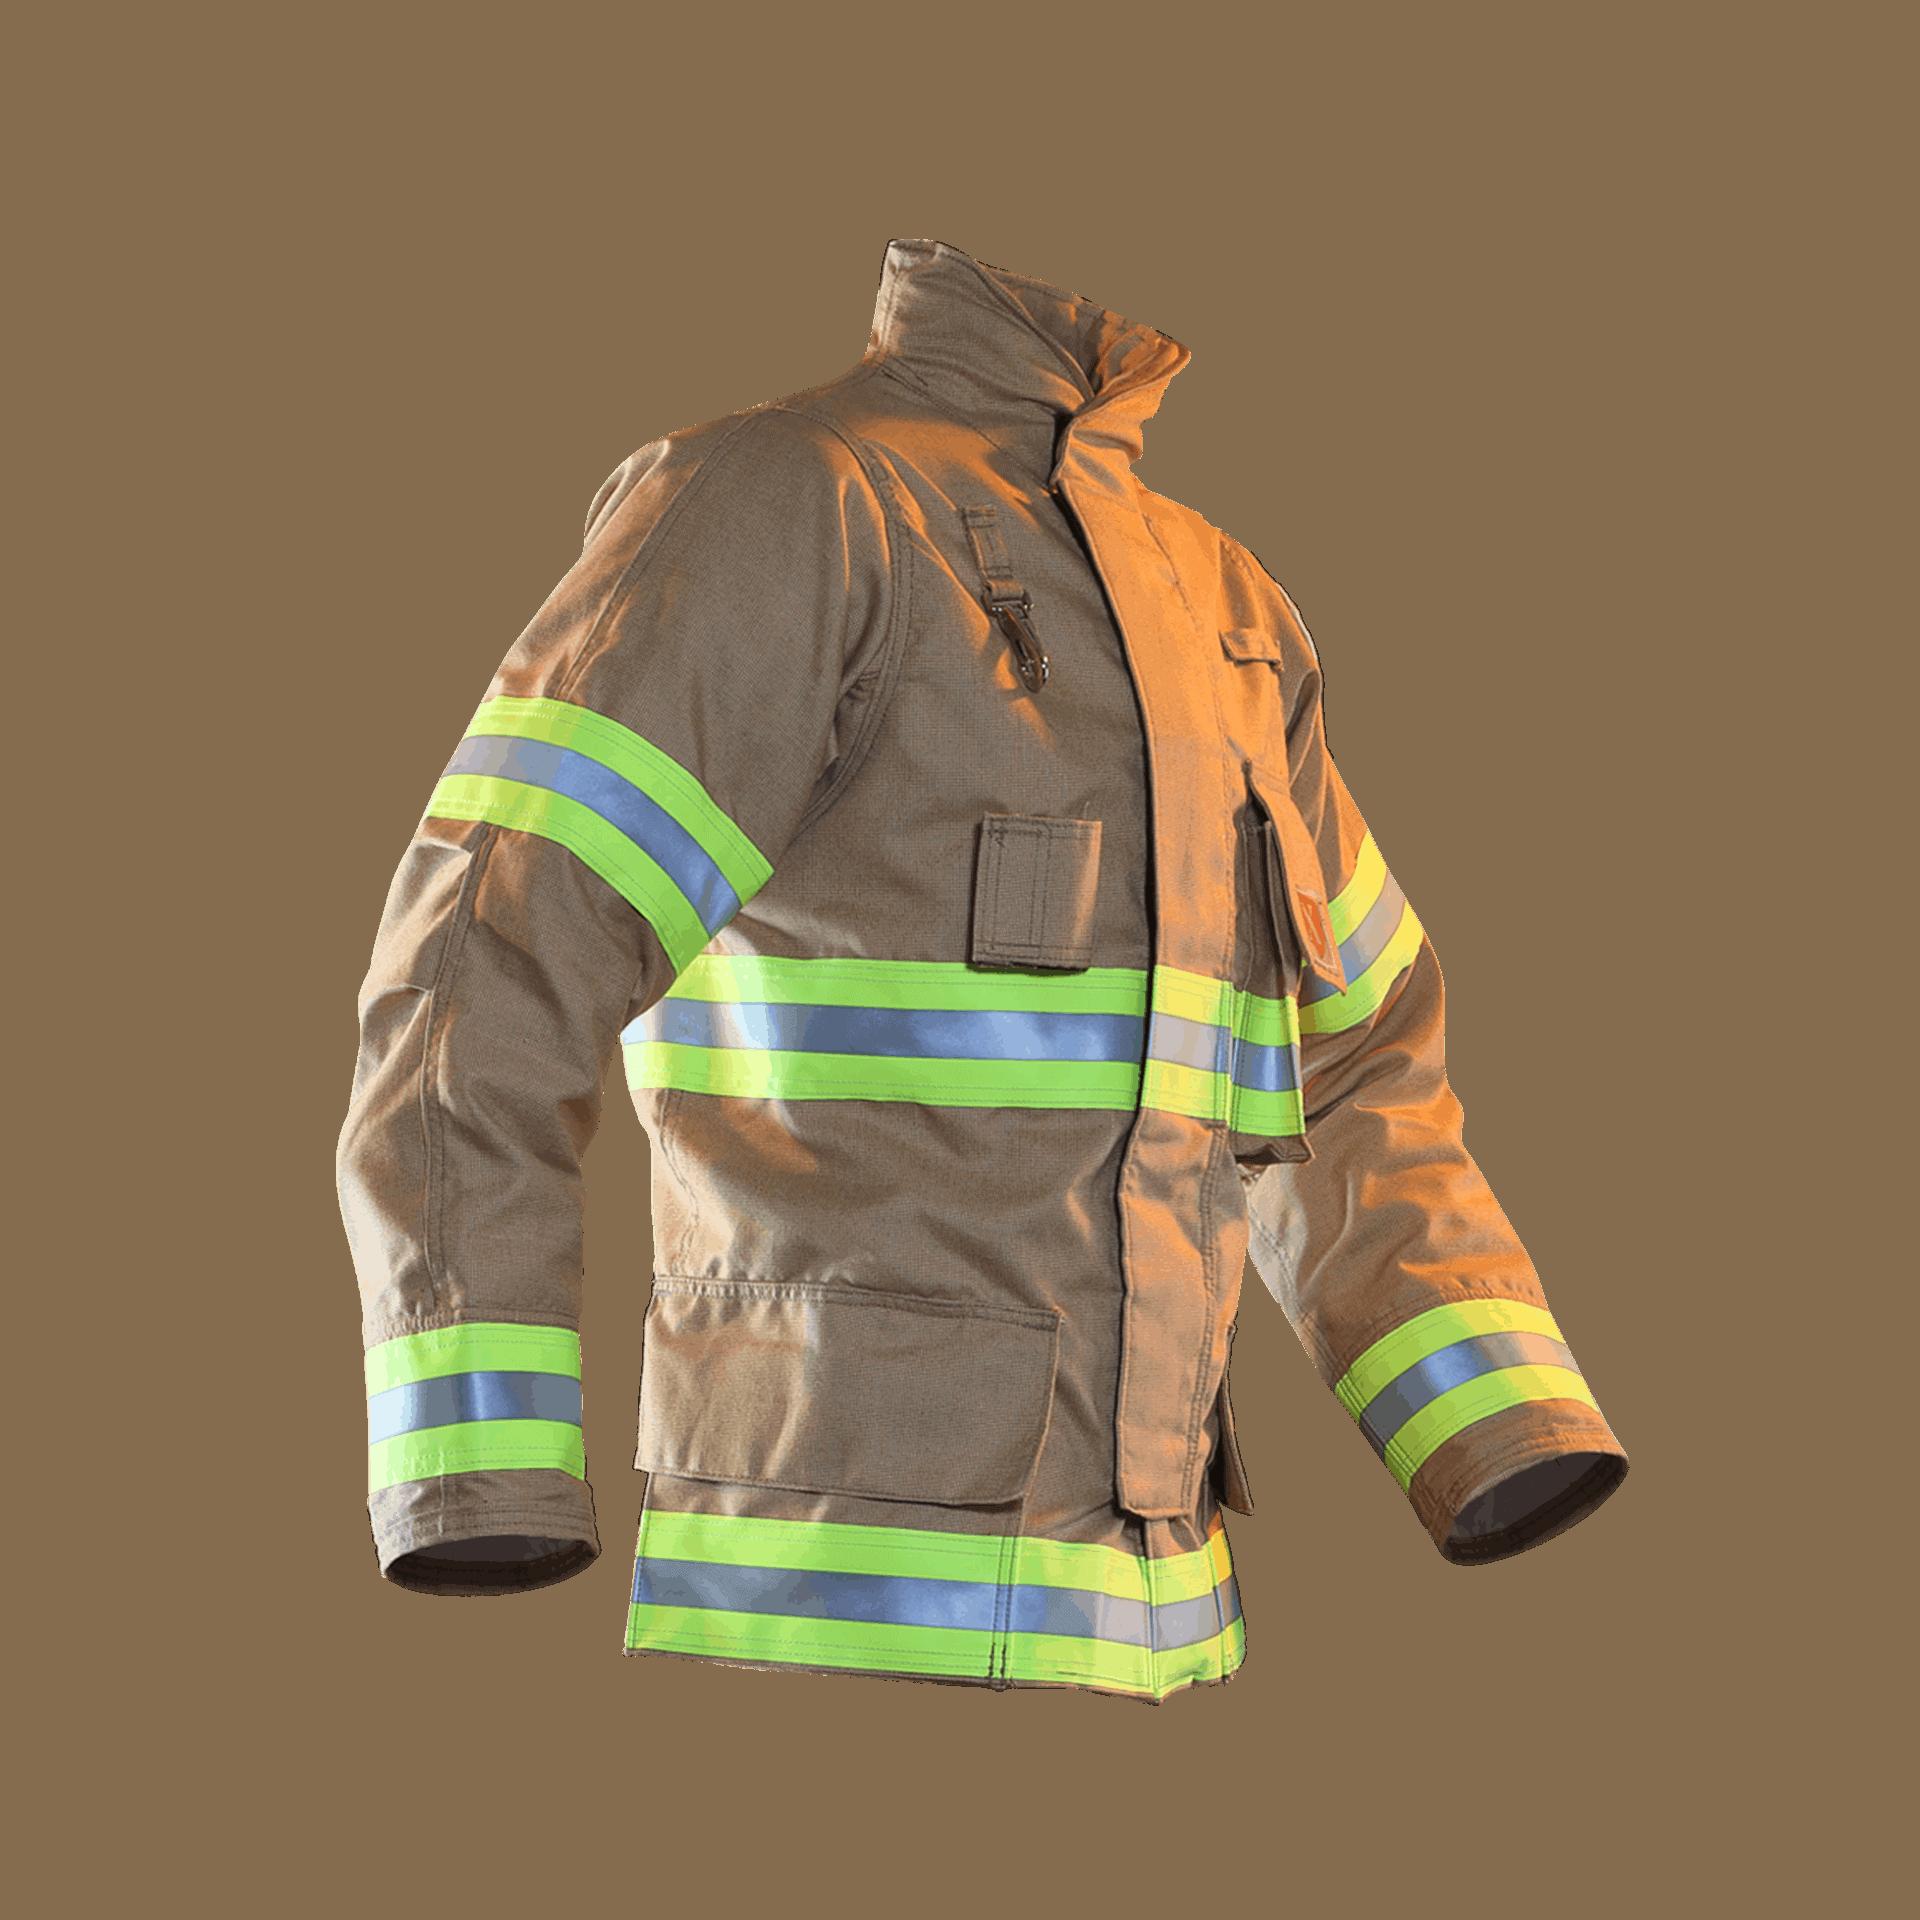 FXR Turnout Gear Coat